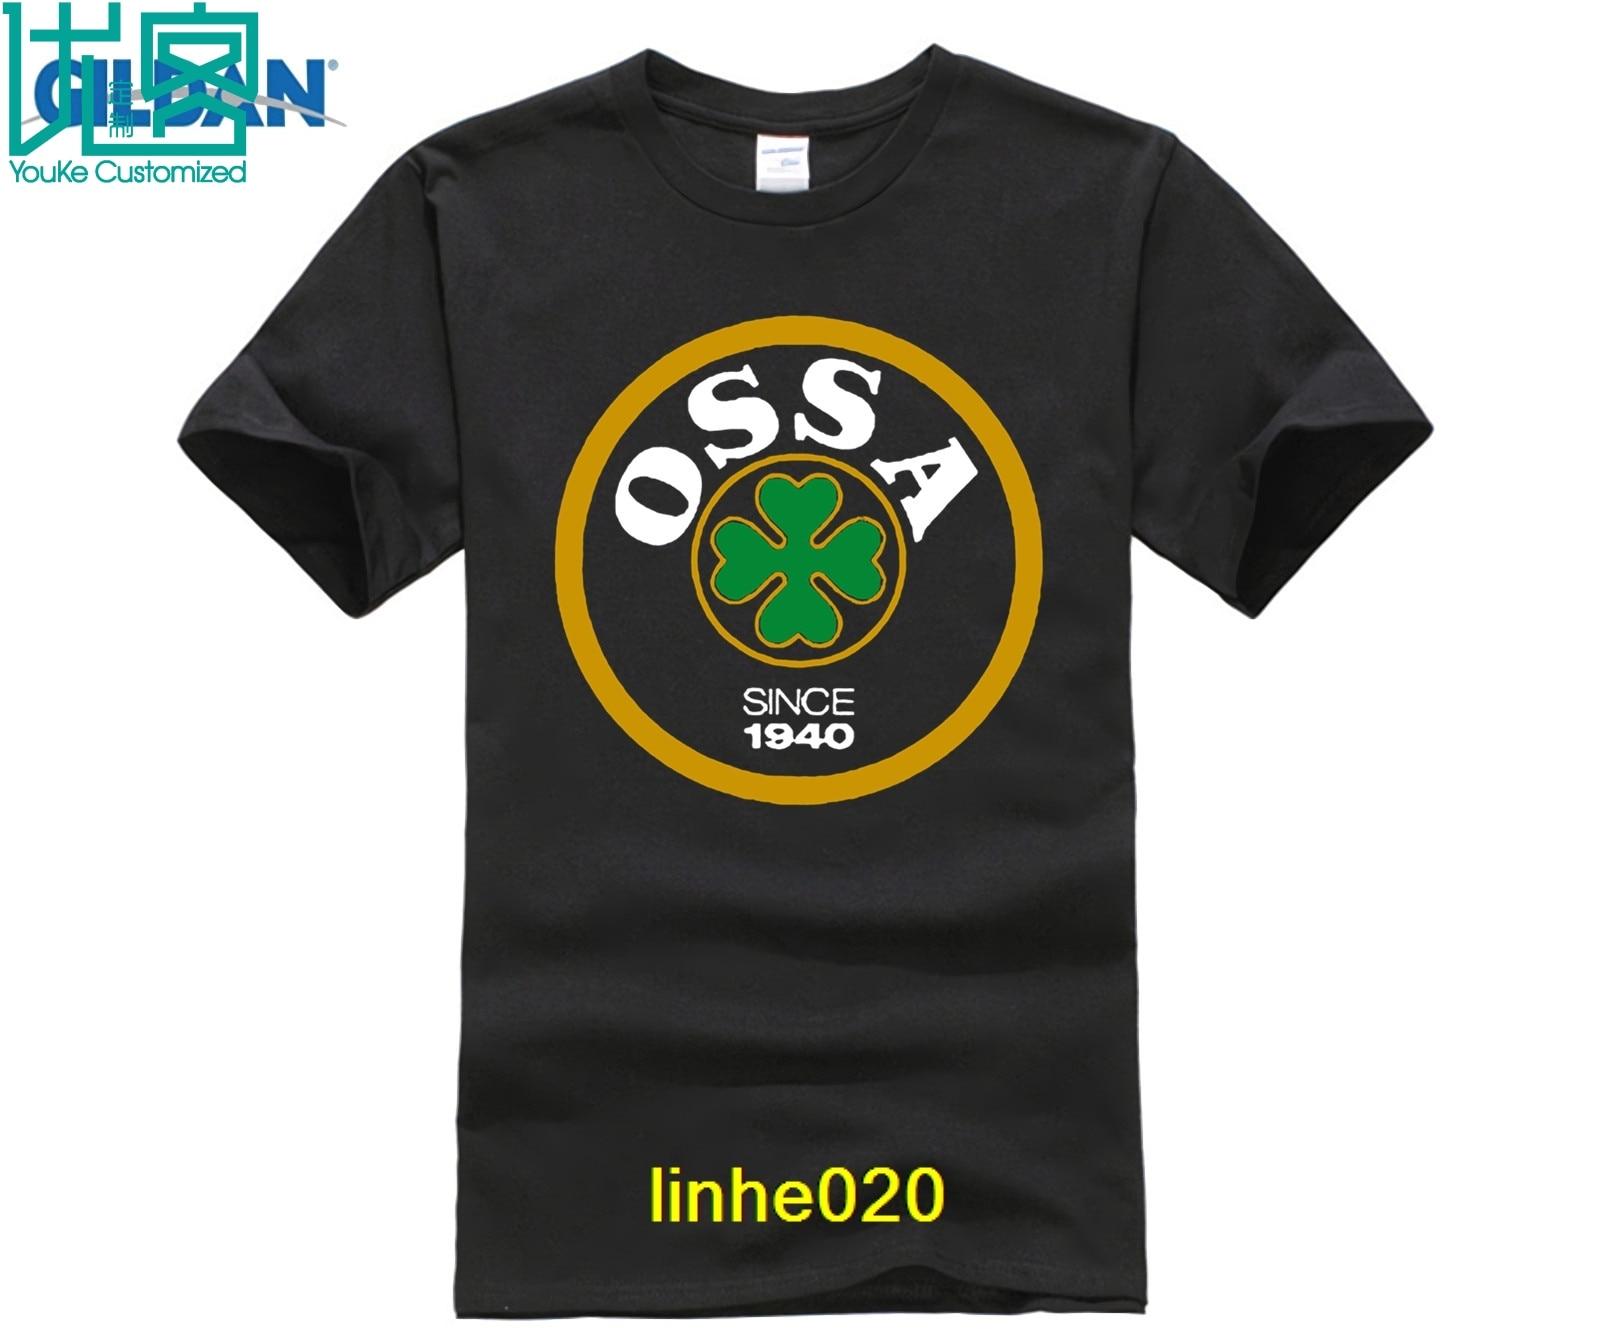 Classic OSSA Retro  Logo Tee Shirt Men's  T-shirt  Lambretta Scooter Gilera Derbi Moto Guzzi Aprilia  Motorbike